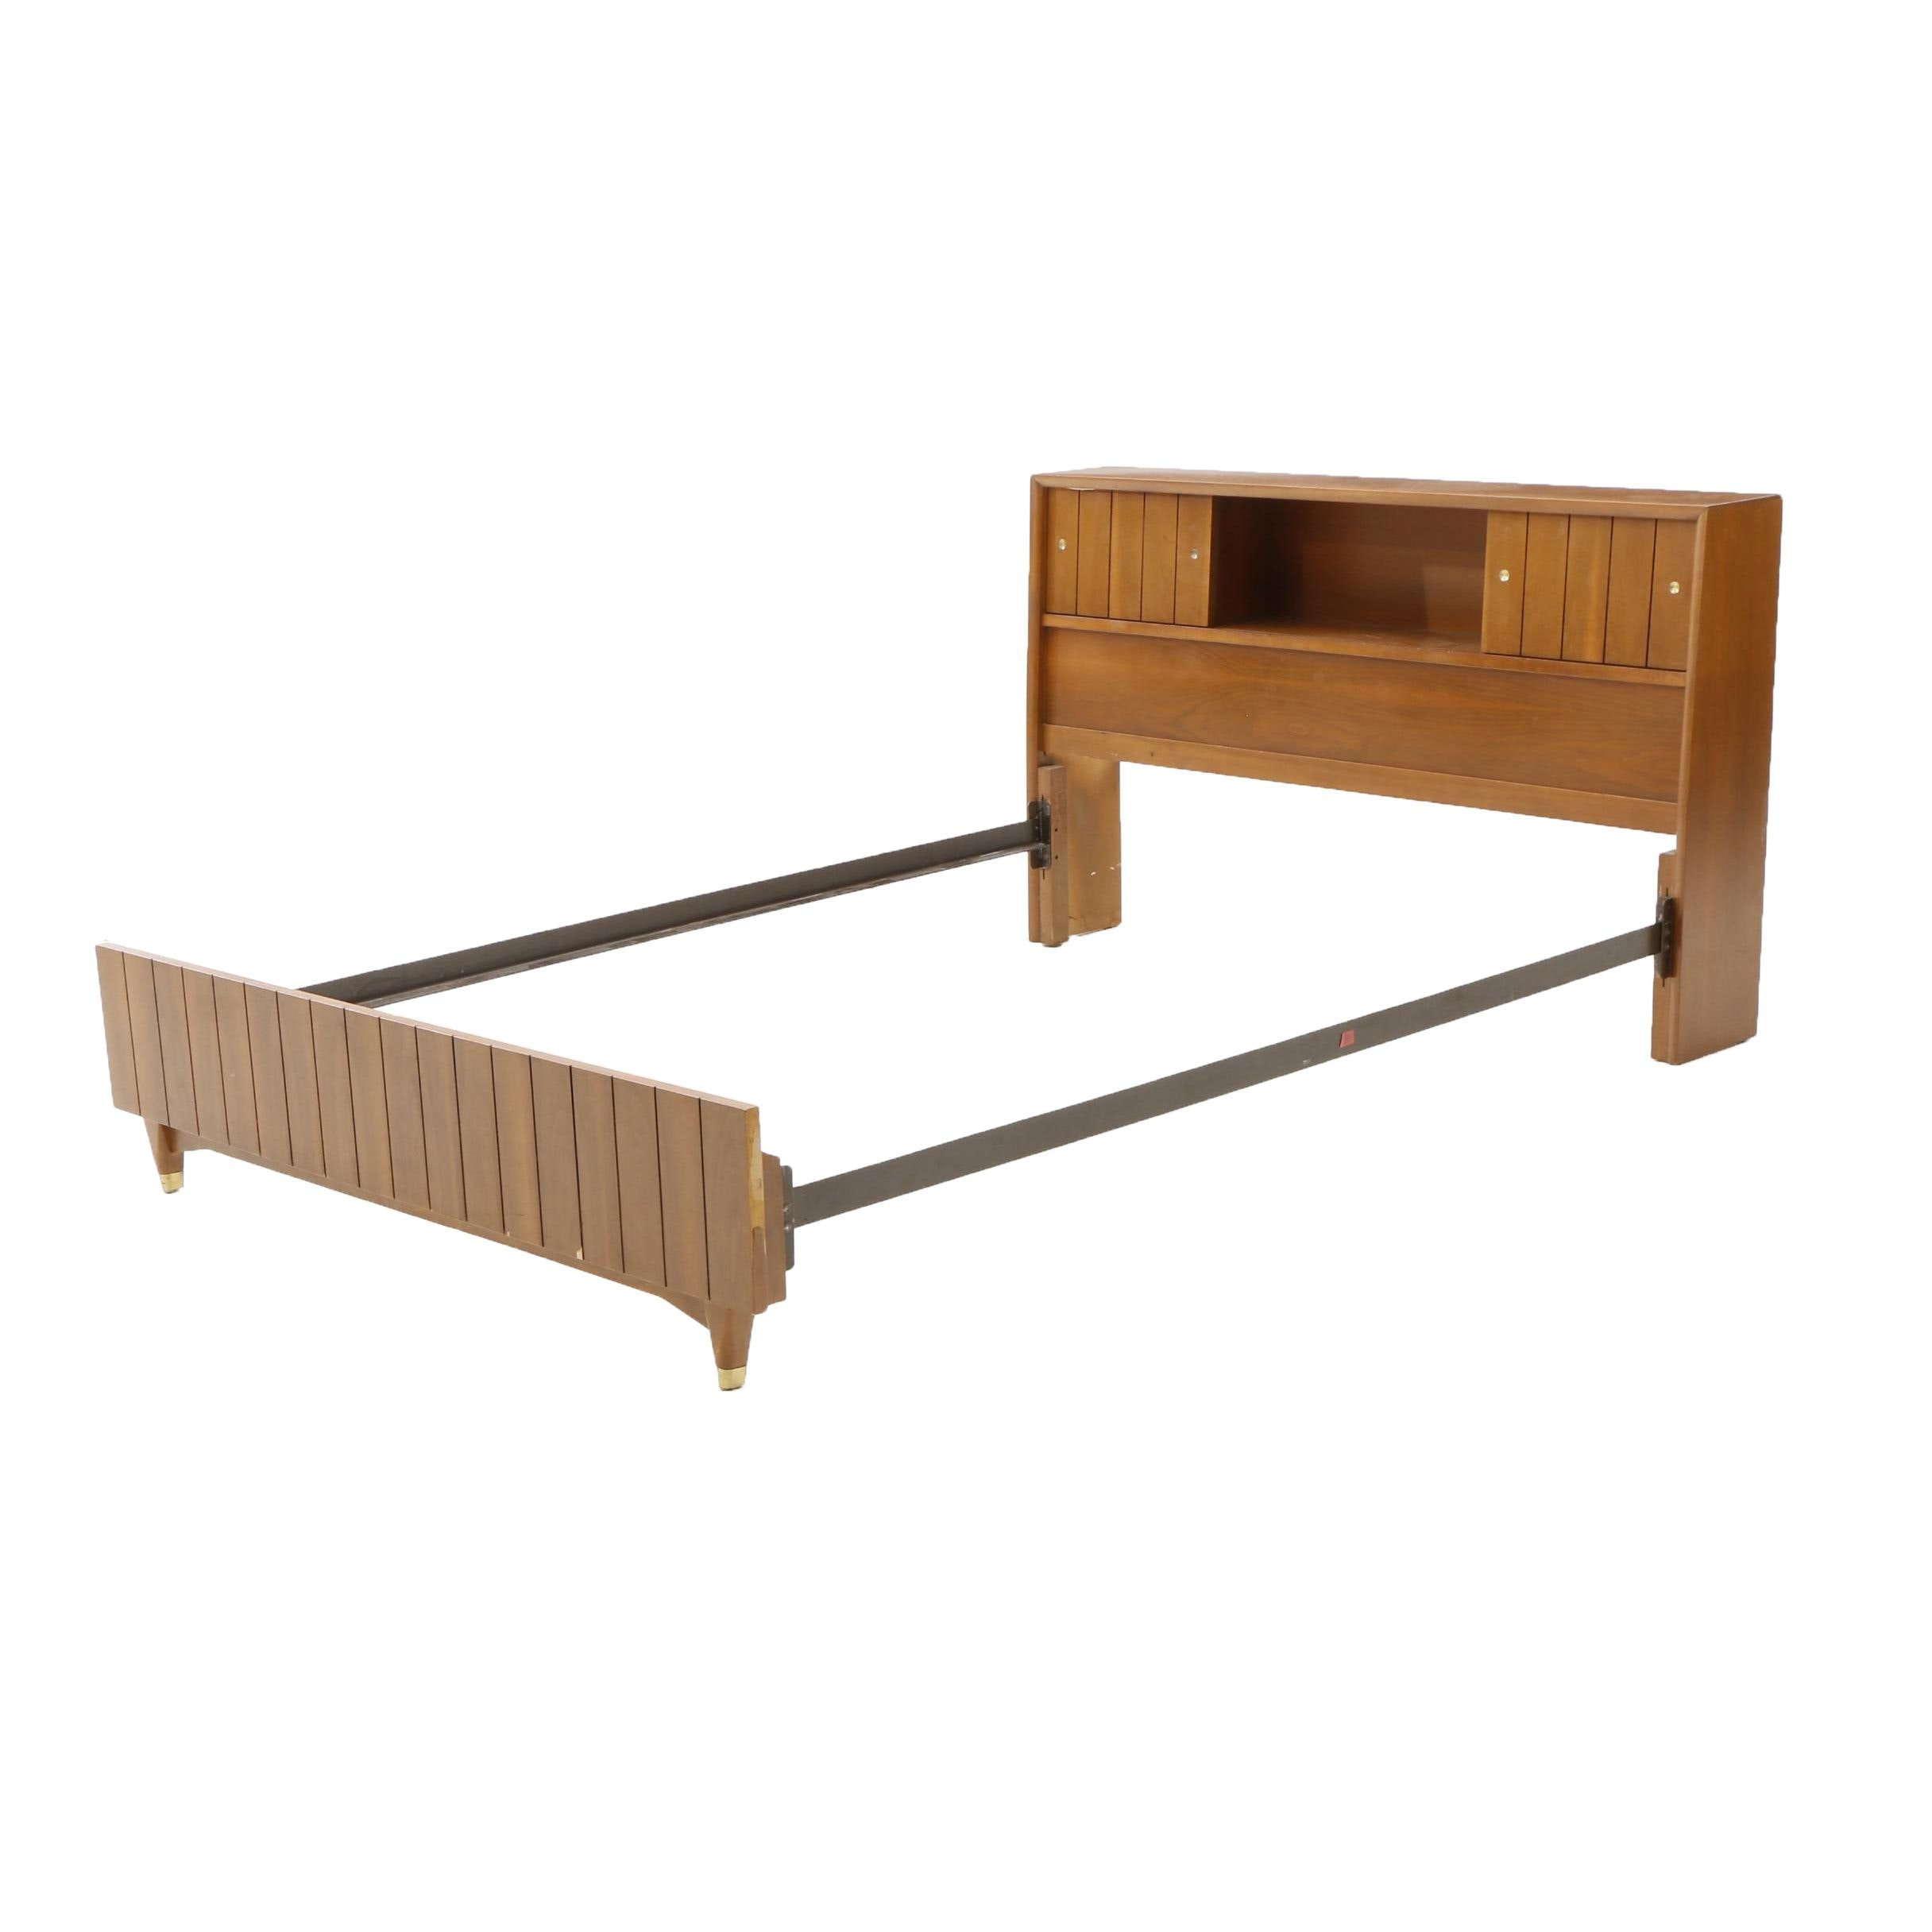 Mid Century Modern Walnut Full-Size Bed Frame by Kroehler